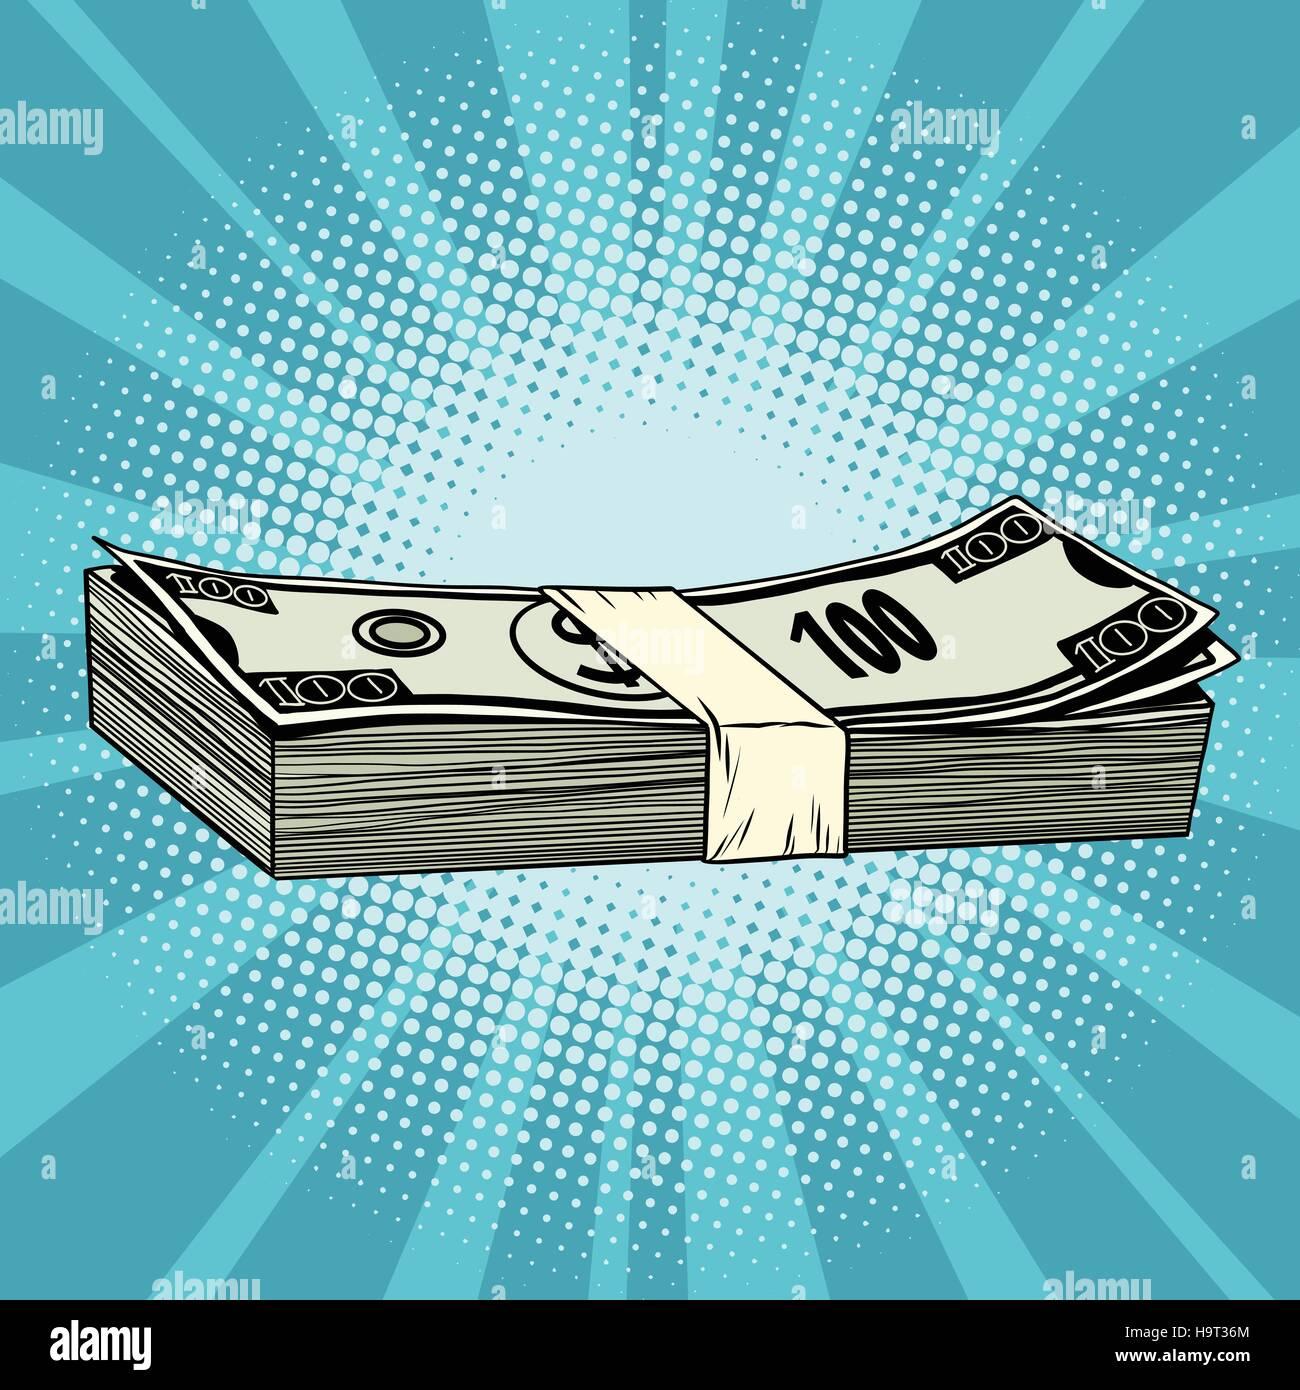 The package of hundred-dollar bills, wealth, business and Finance, pop art retro vector illustration - Stock Vector